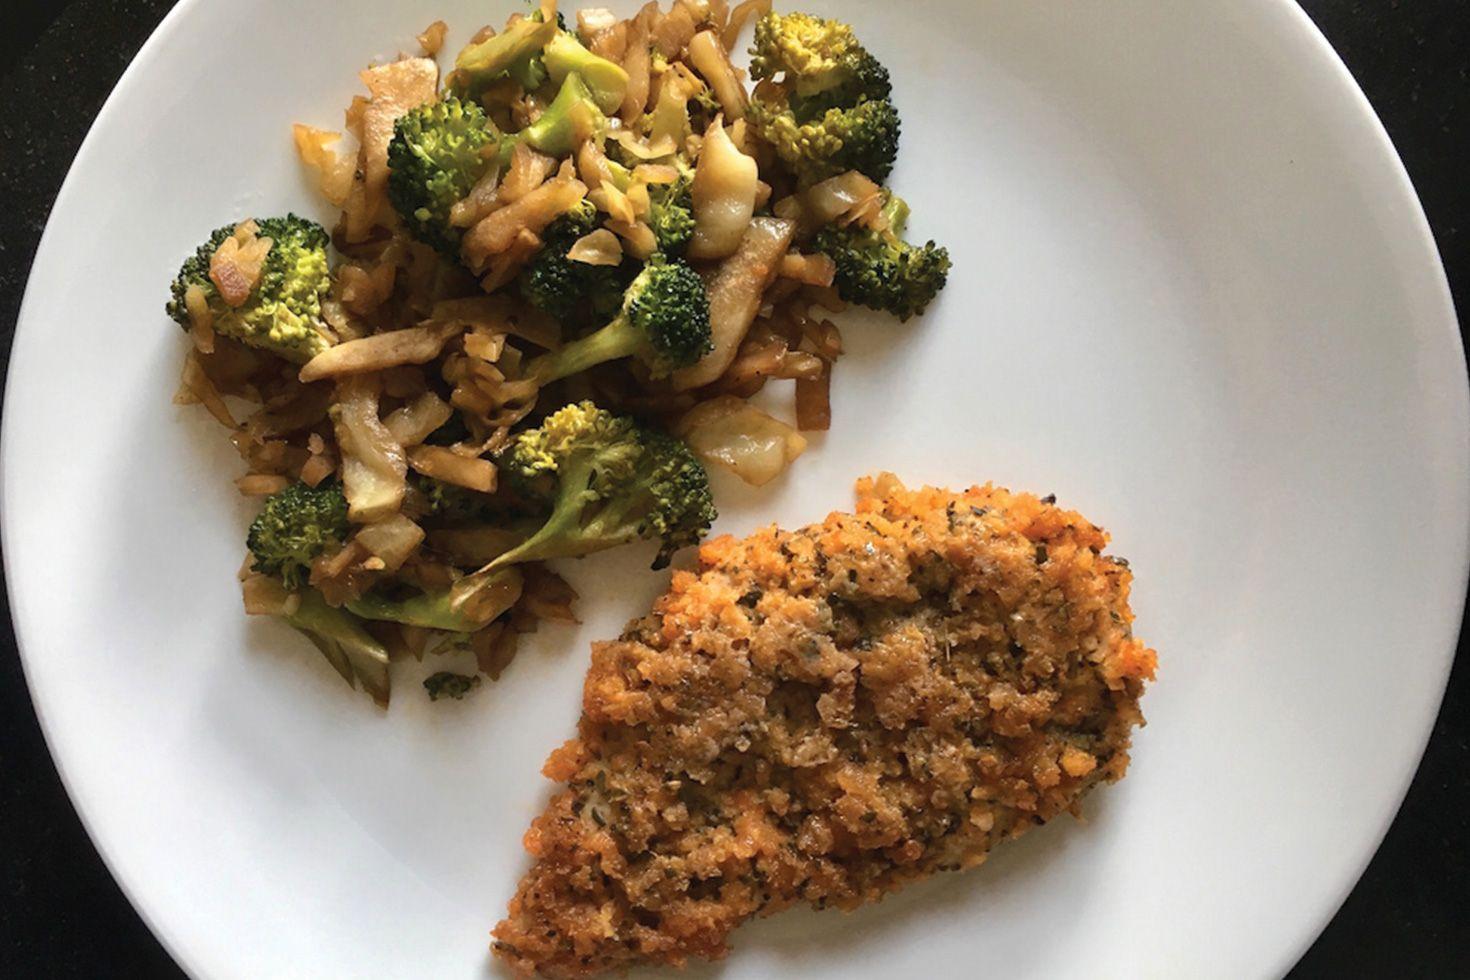 Chicen breast and sauteed broccoli